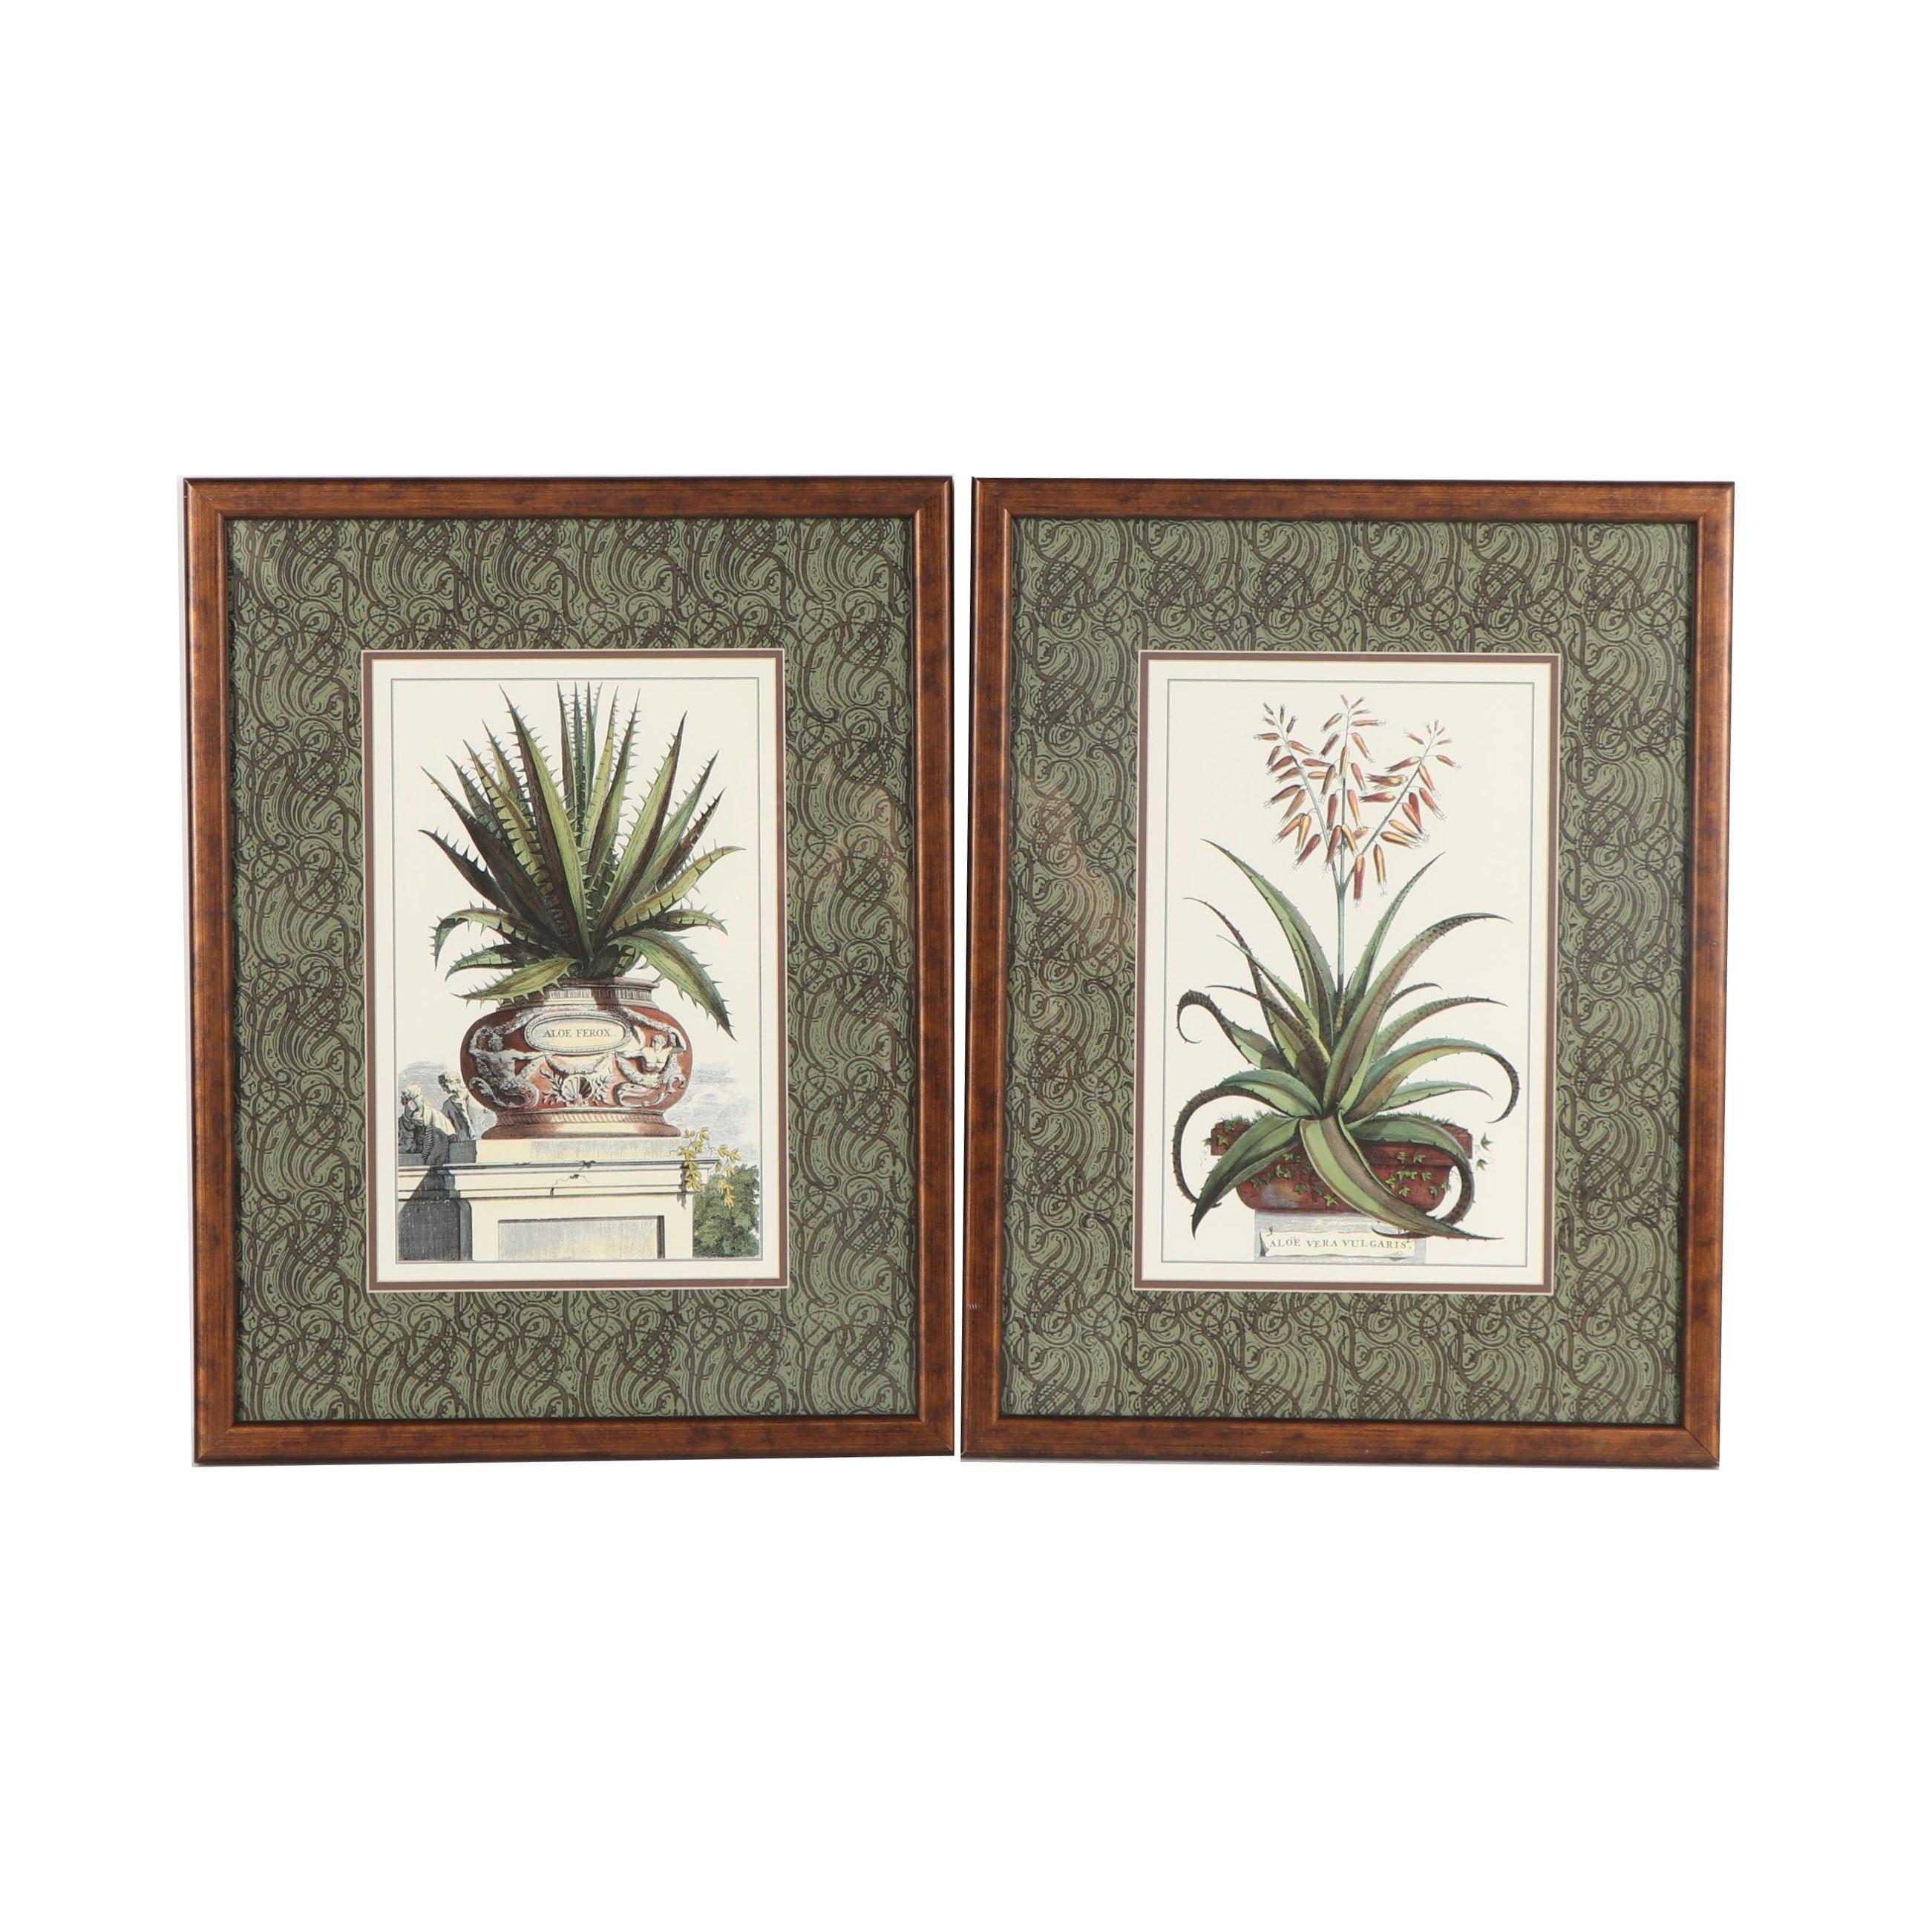 Botanical Lithographs after Abraham Munting